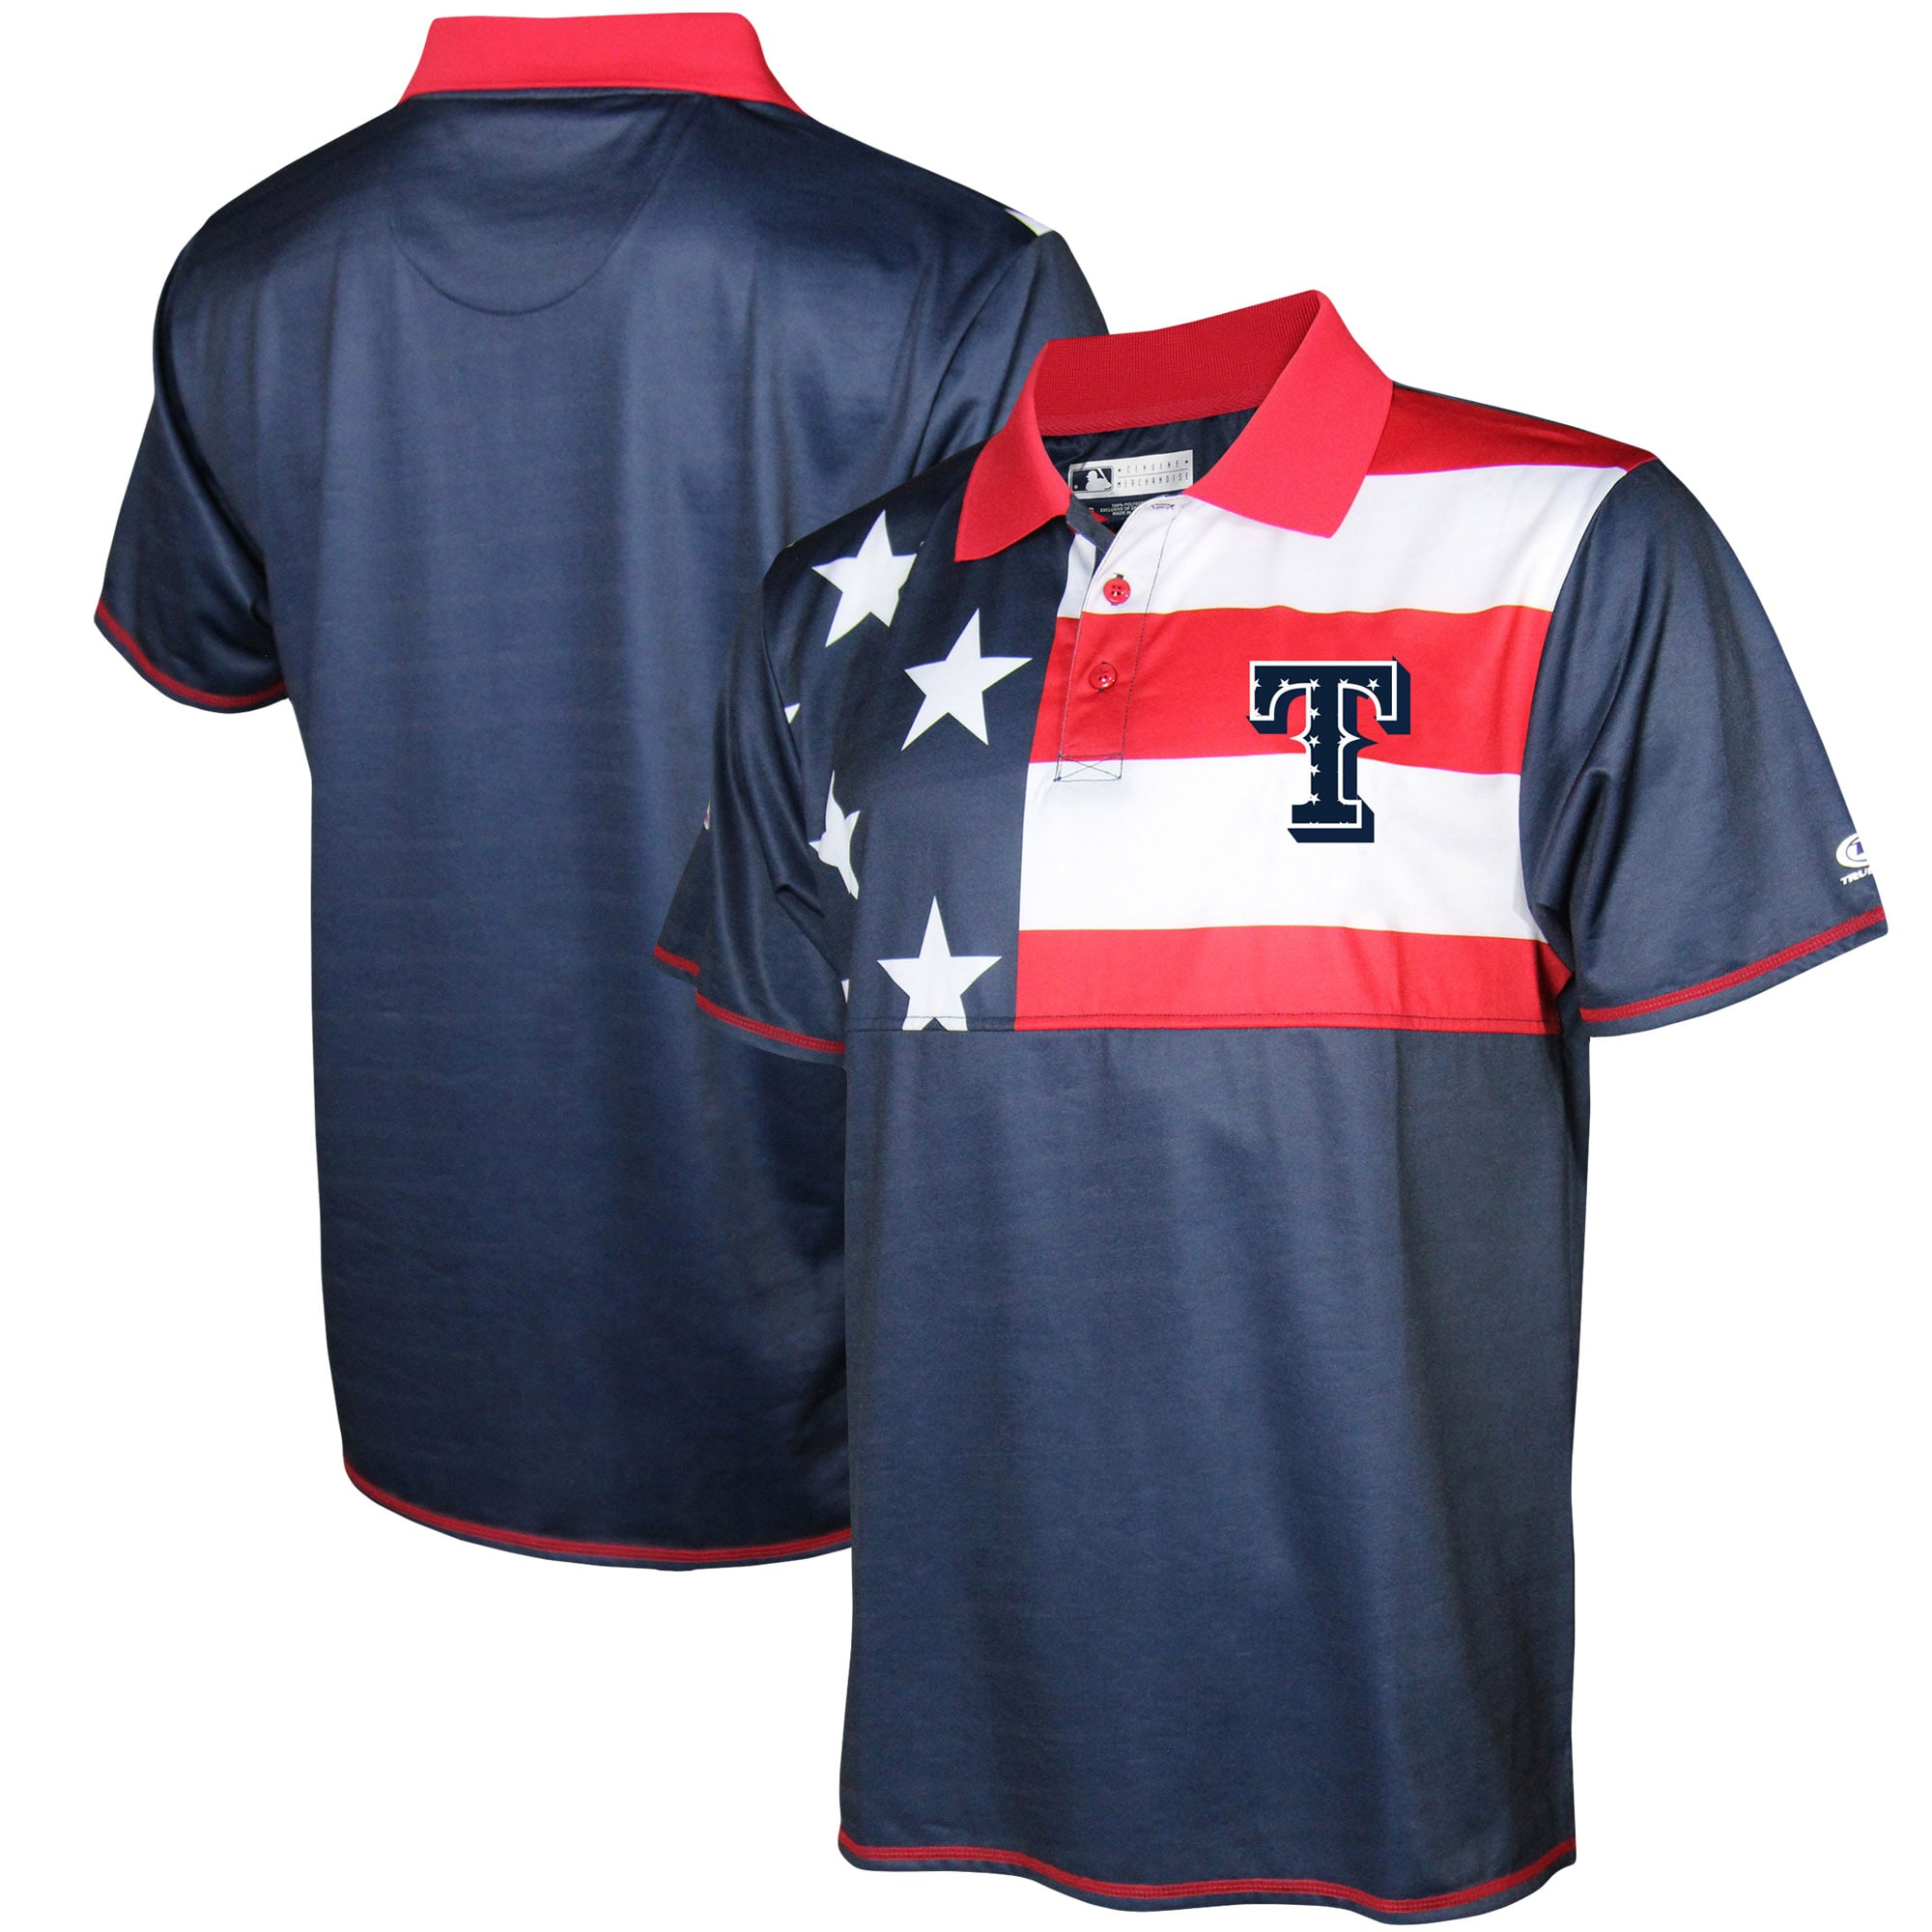 Texas Rangers Stitches Stars & Stripe Polo - Navy/Red